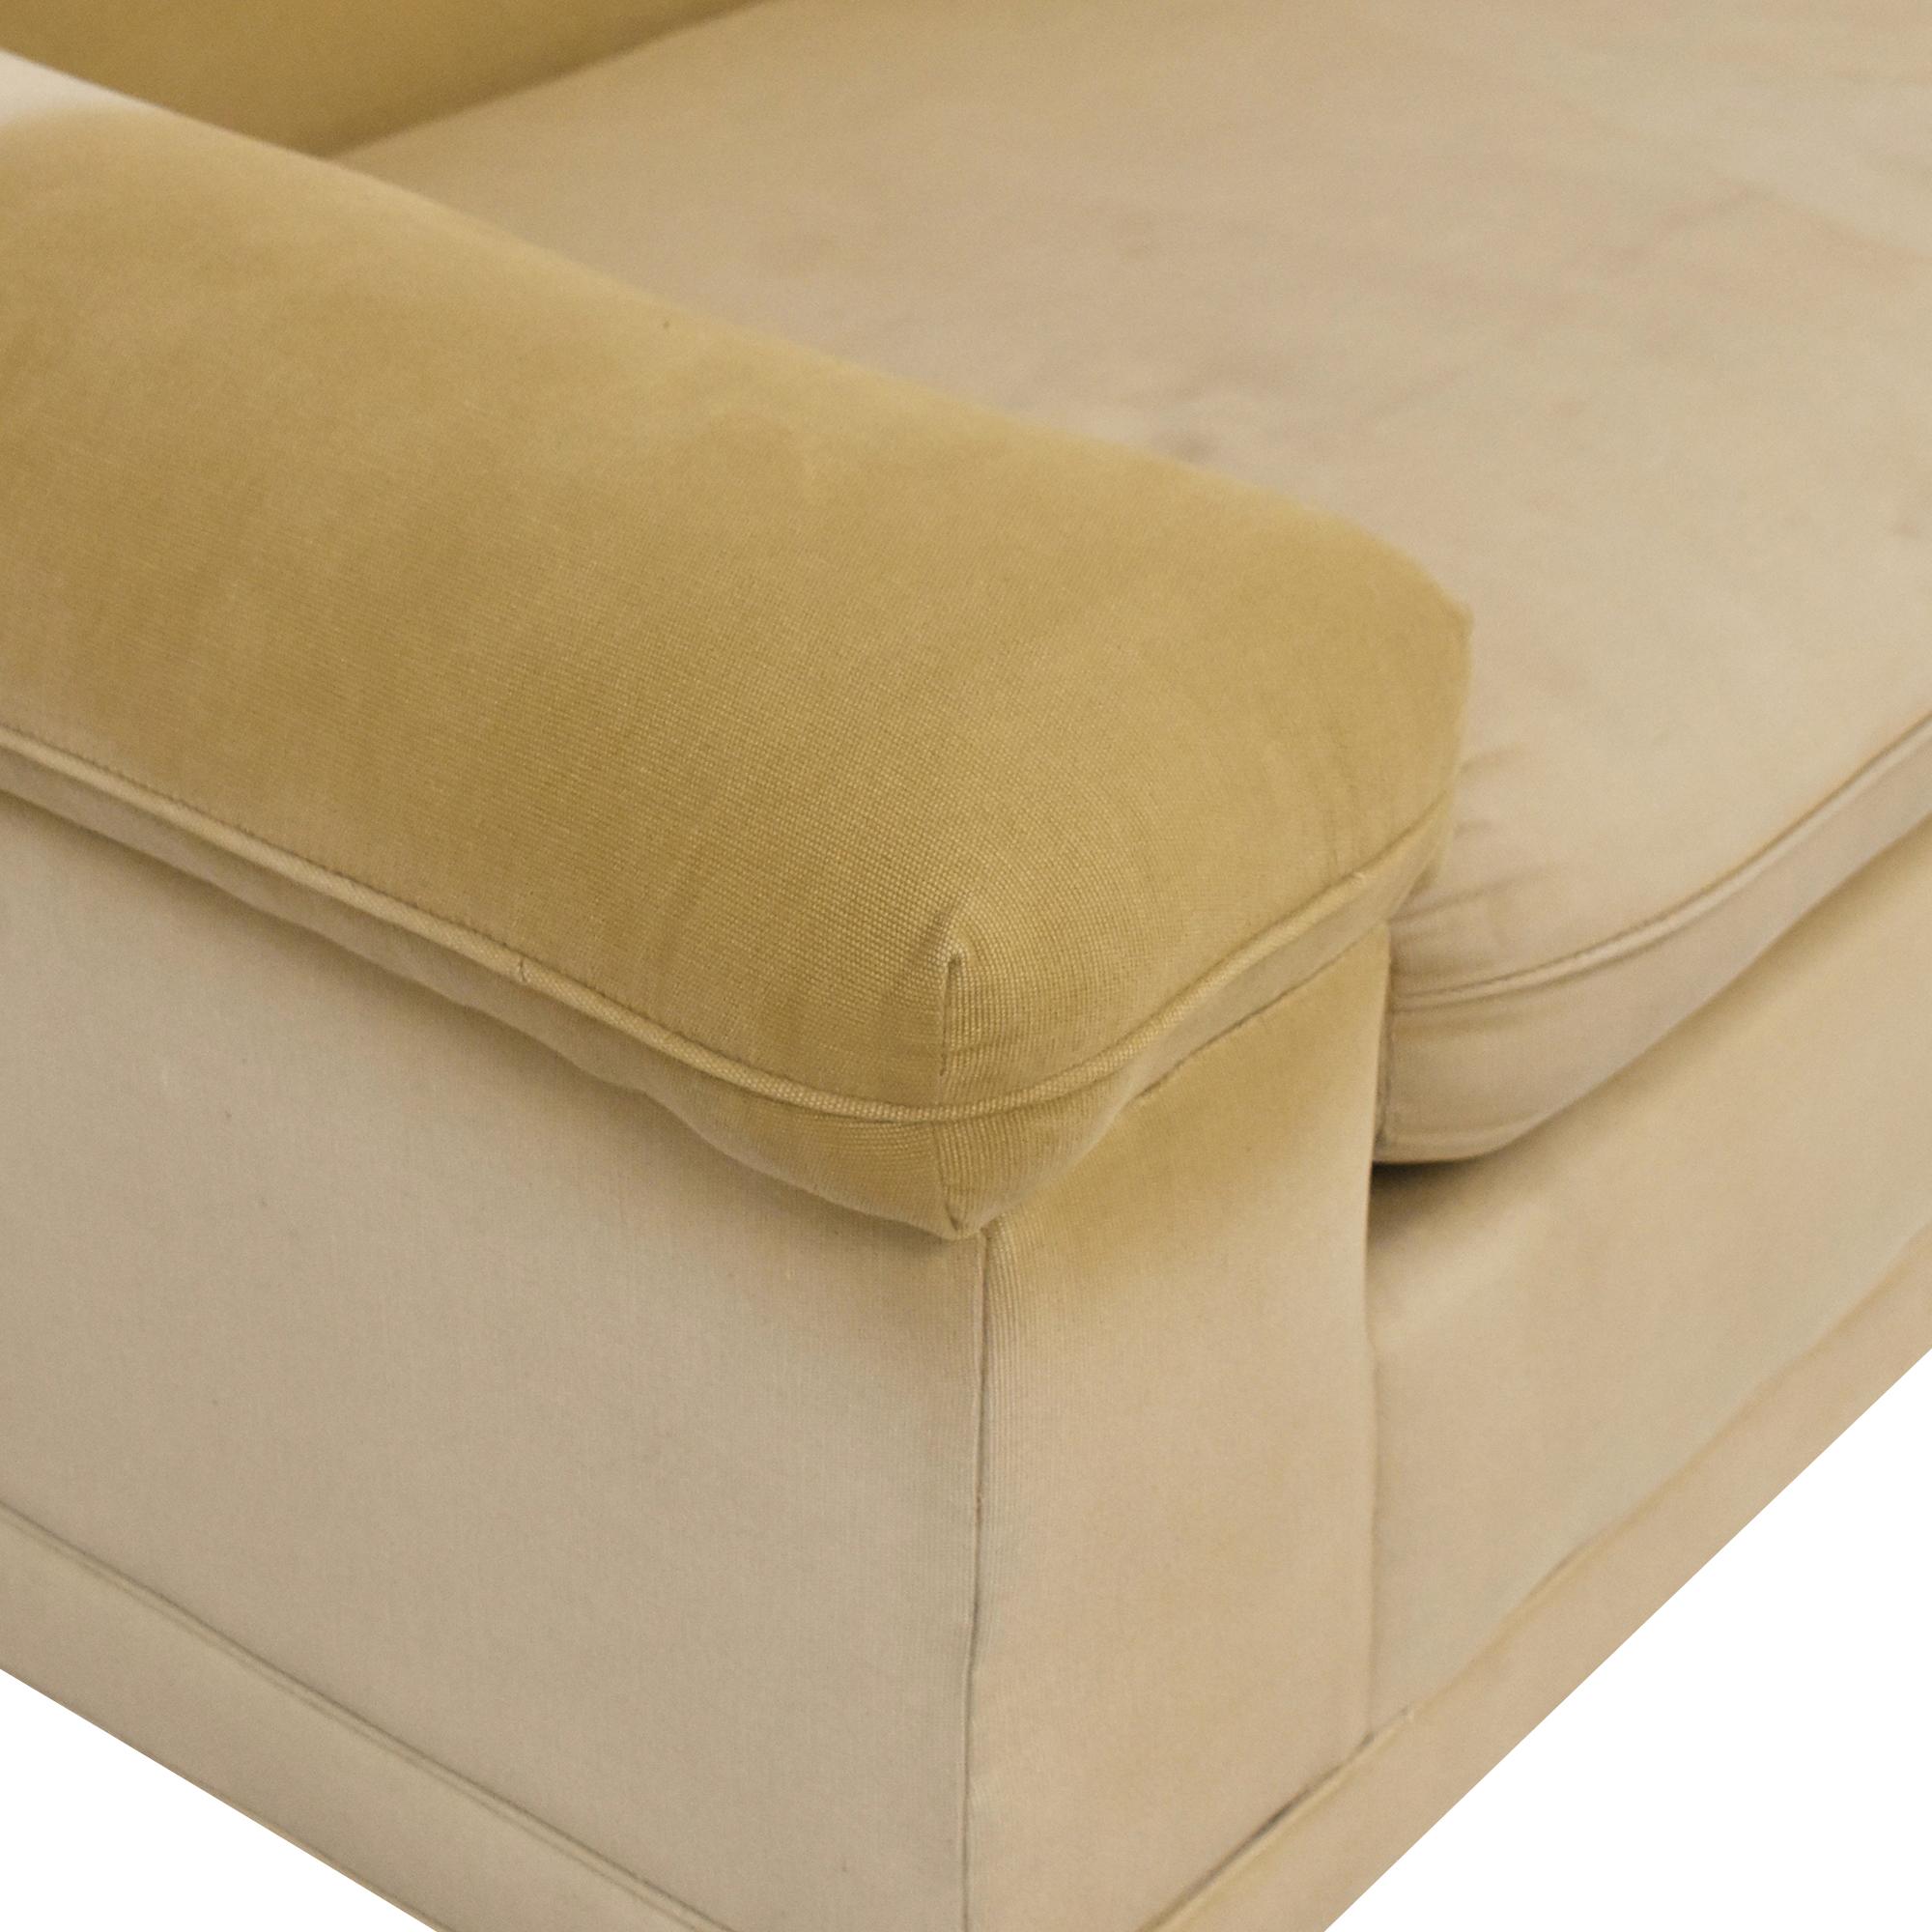 Cameo Collection Cameo Collection Two Seat Sleeper Sofa coupon